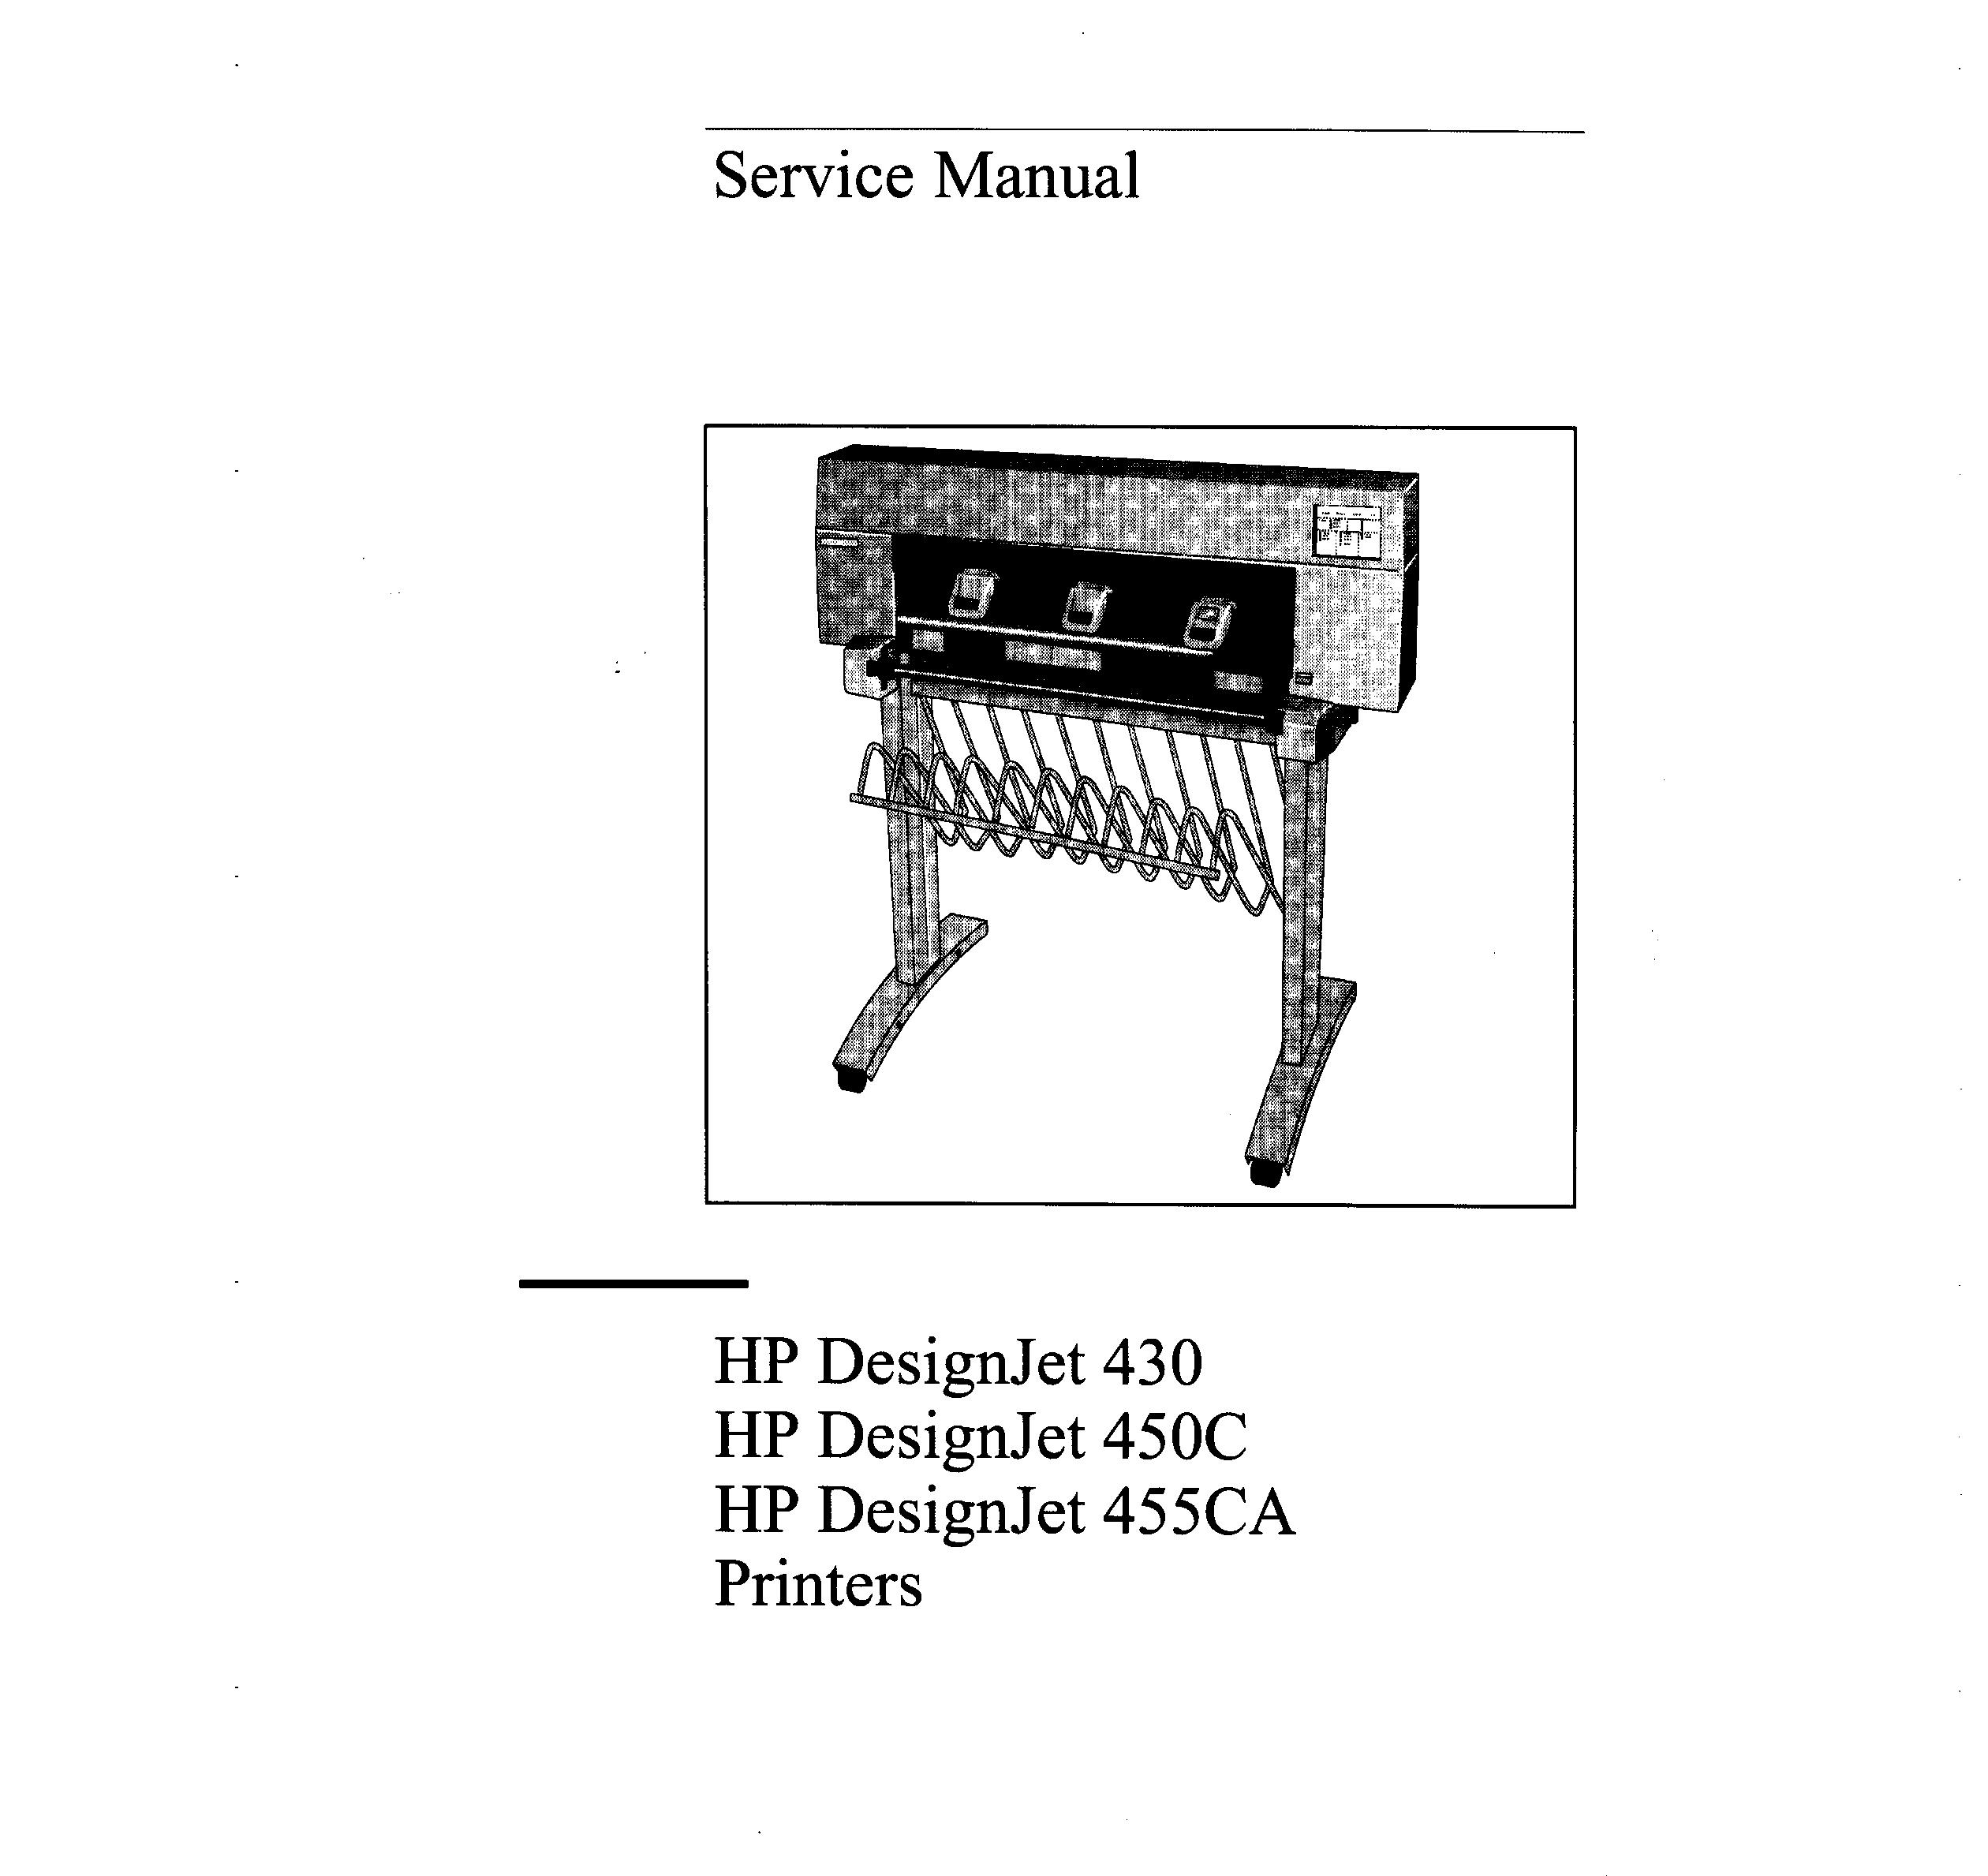 Https Post Wiring Diagram Symbols Odd In Ceiling Rose Diynotcom Diy And Home Improvement Servicemanual1